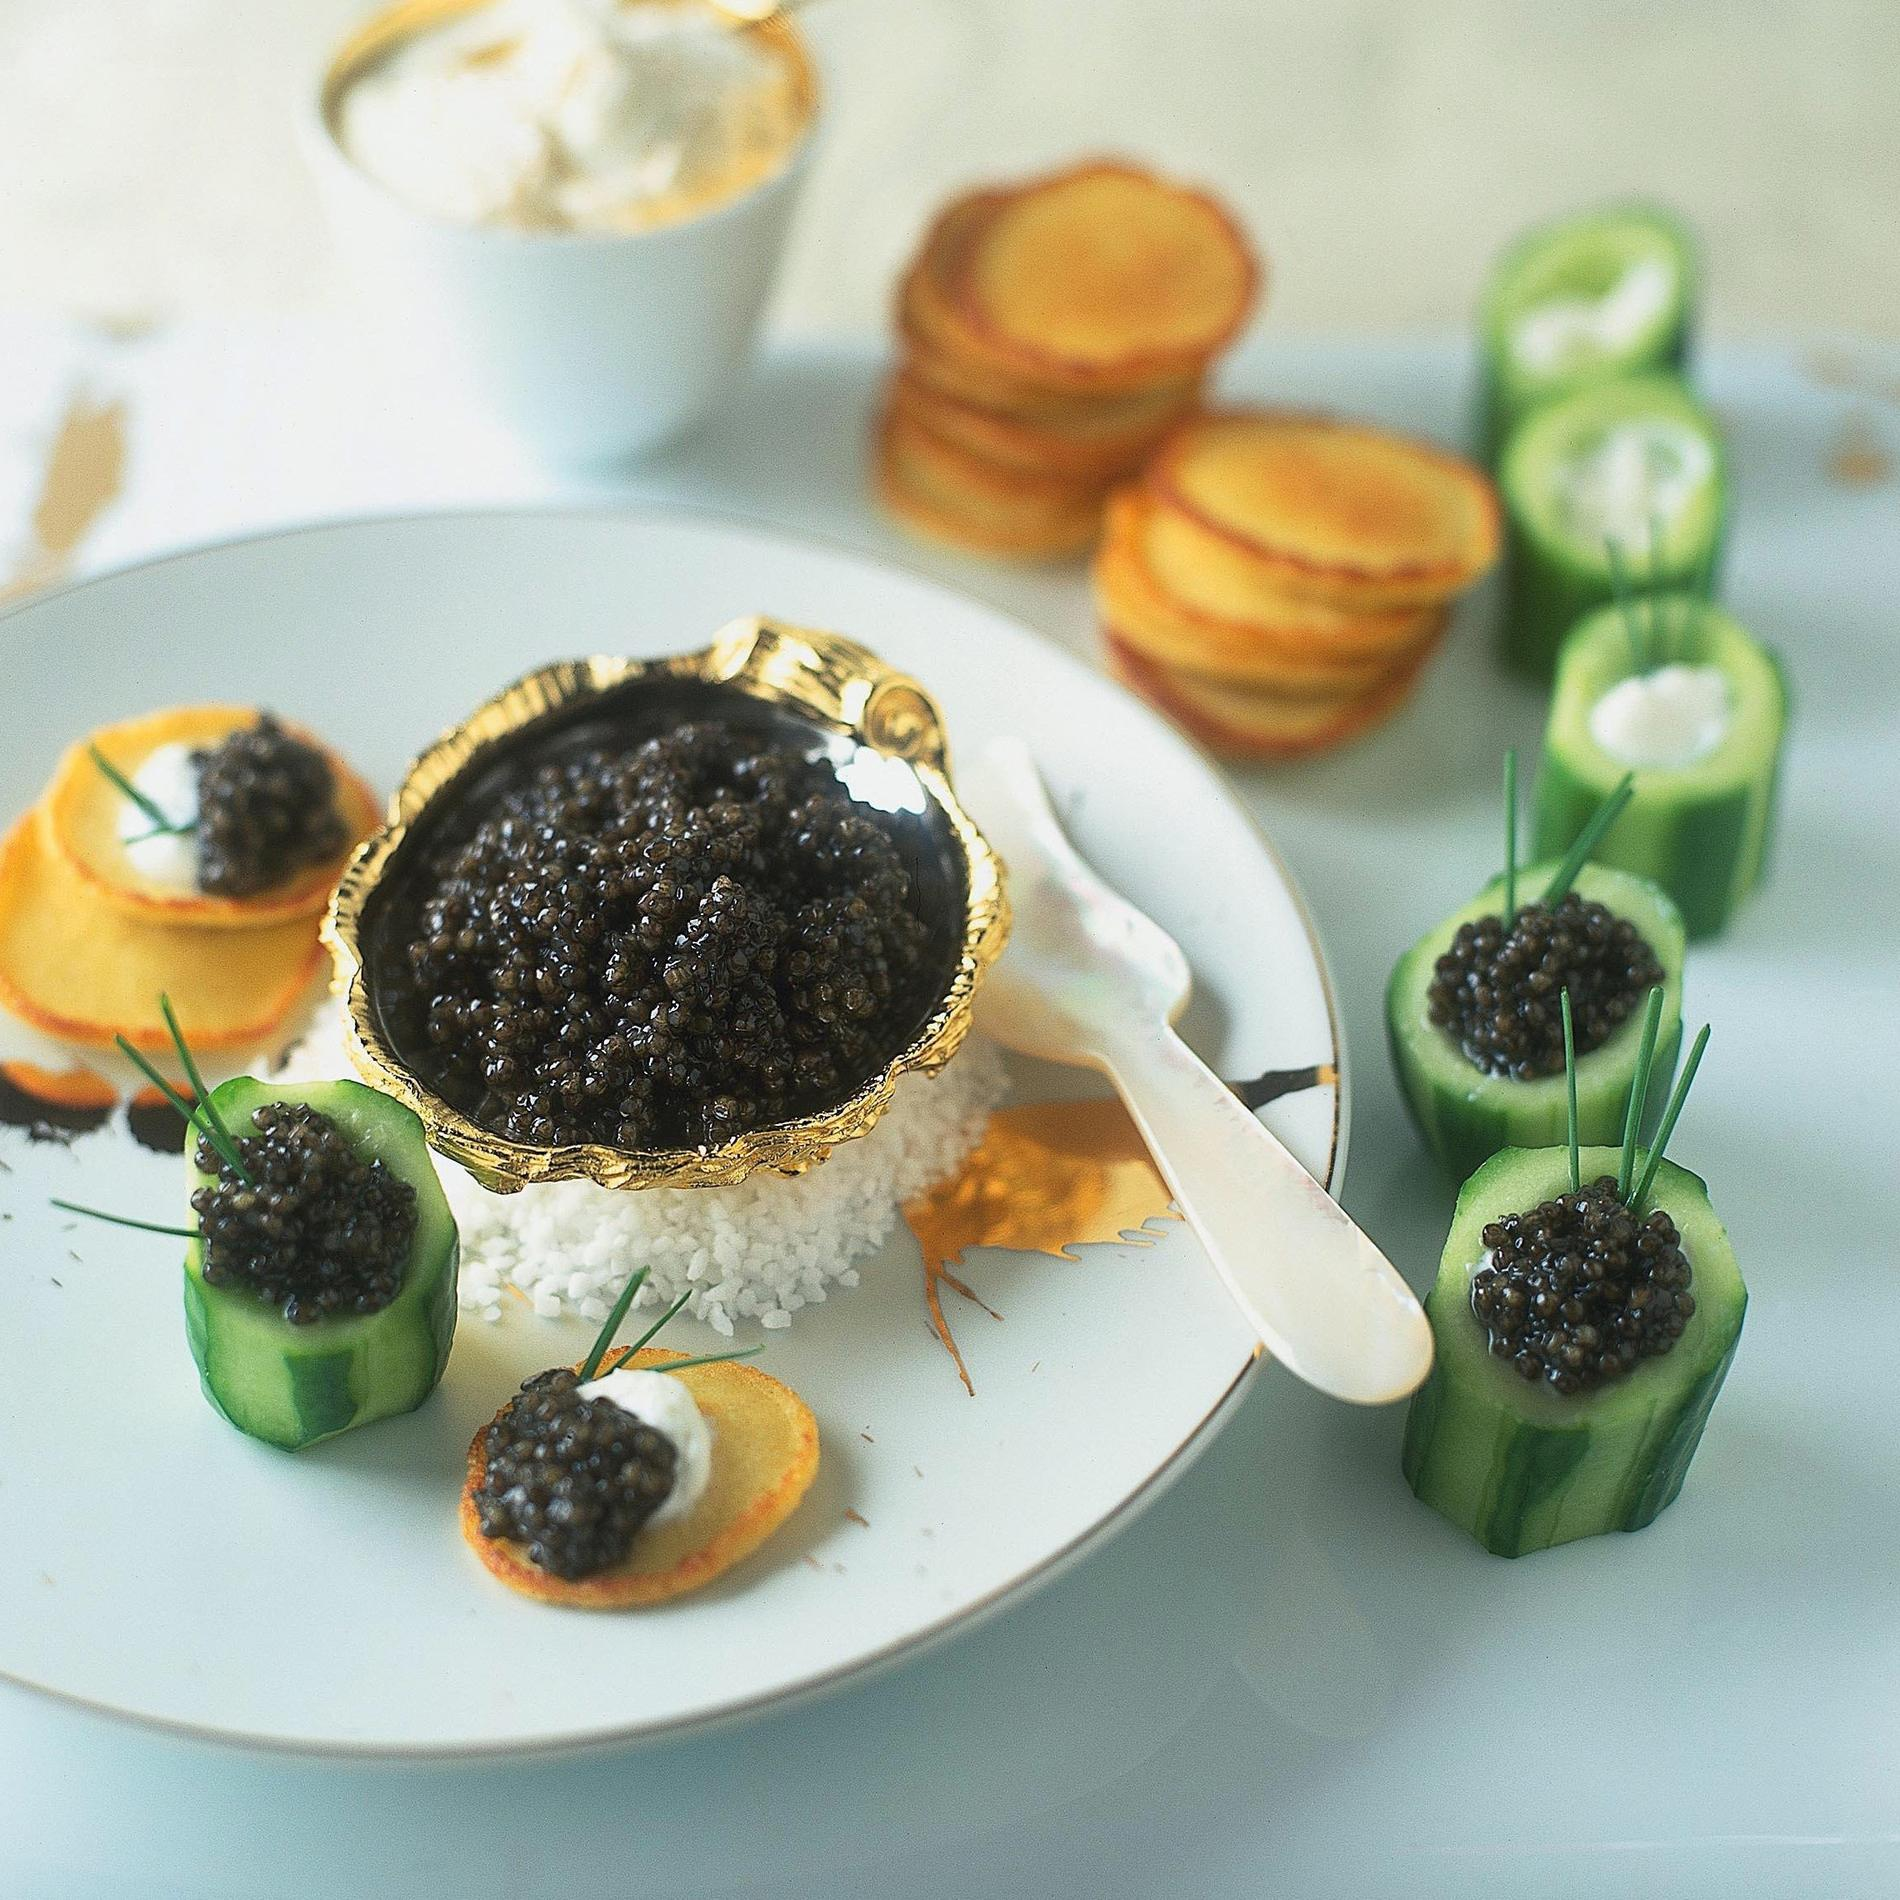 Recette amuse bouche au caviar cuisine madame figaro - Recette amuse bouche rapide ...